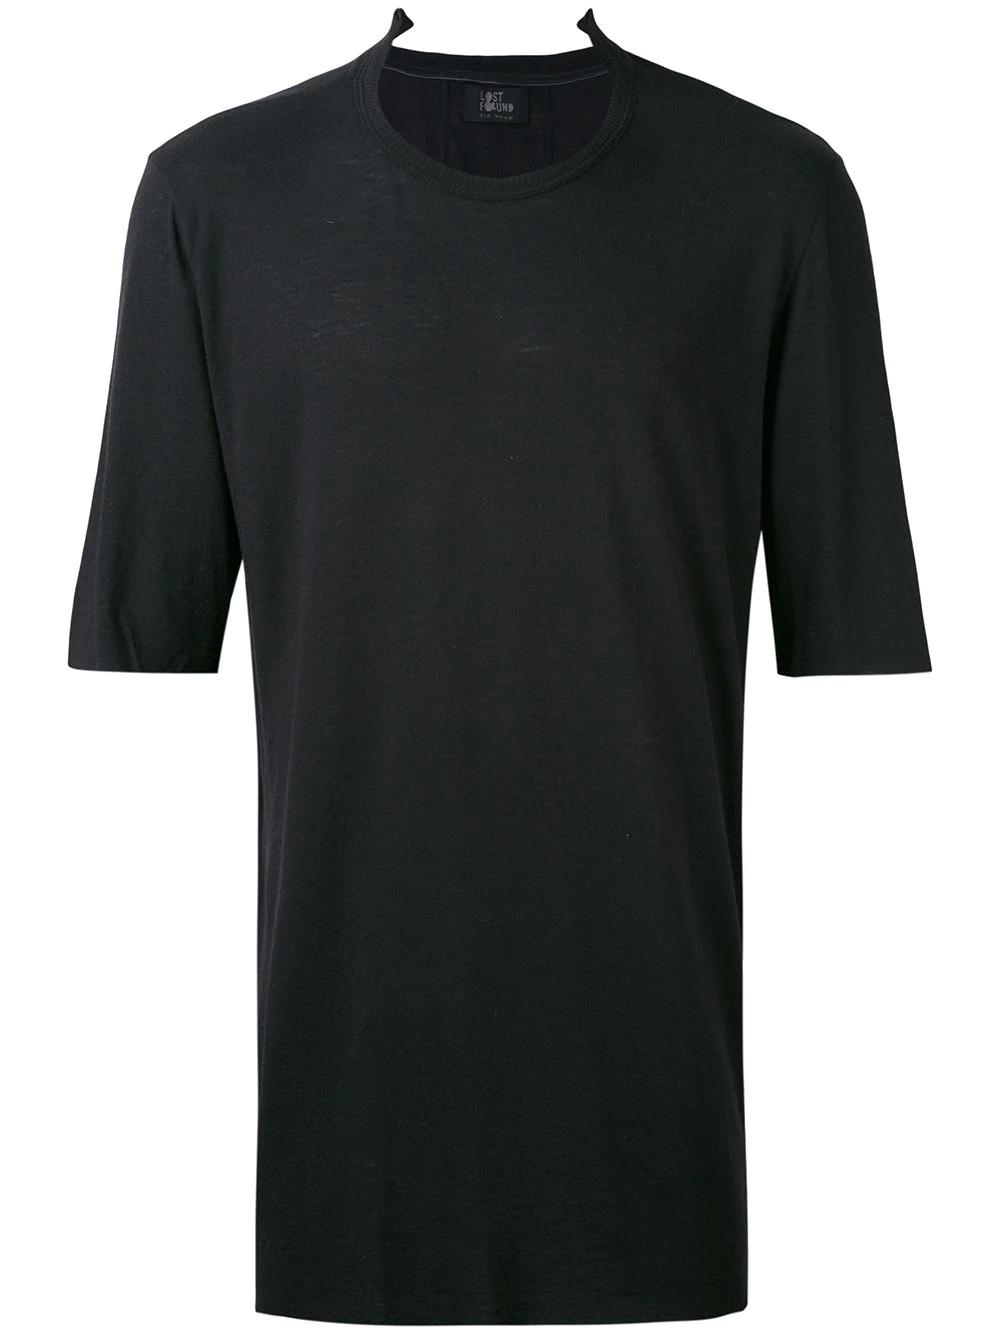 Lost & Found   базовая футболка   Clouty